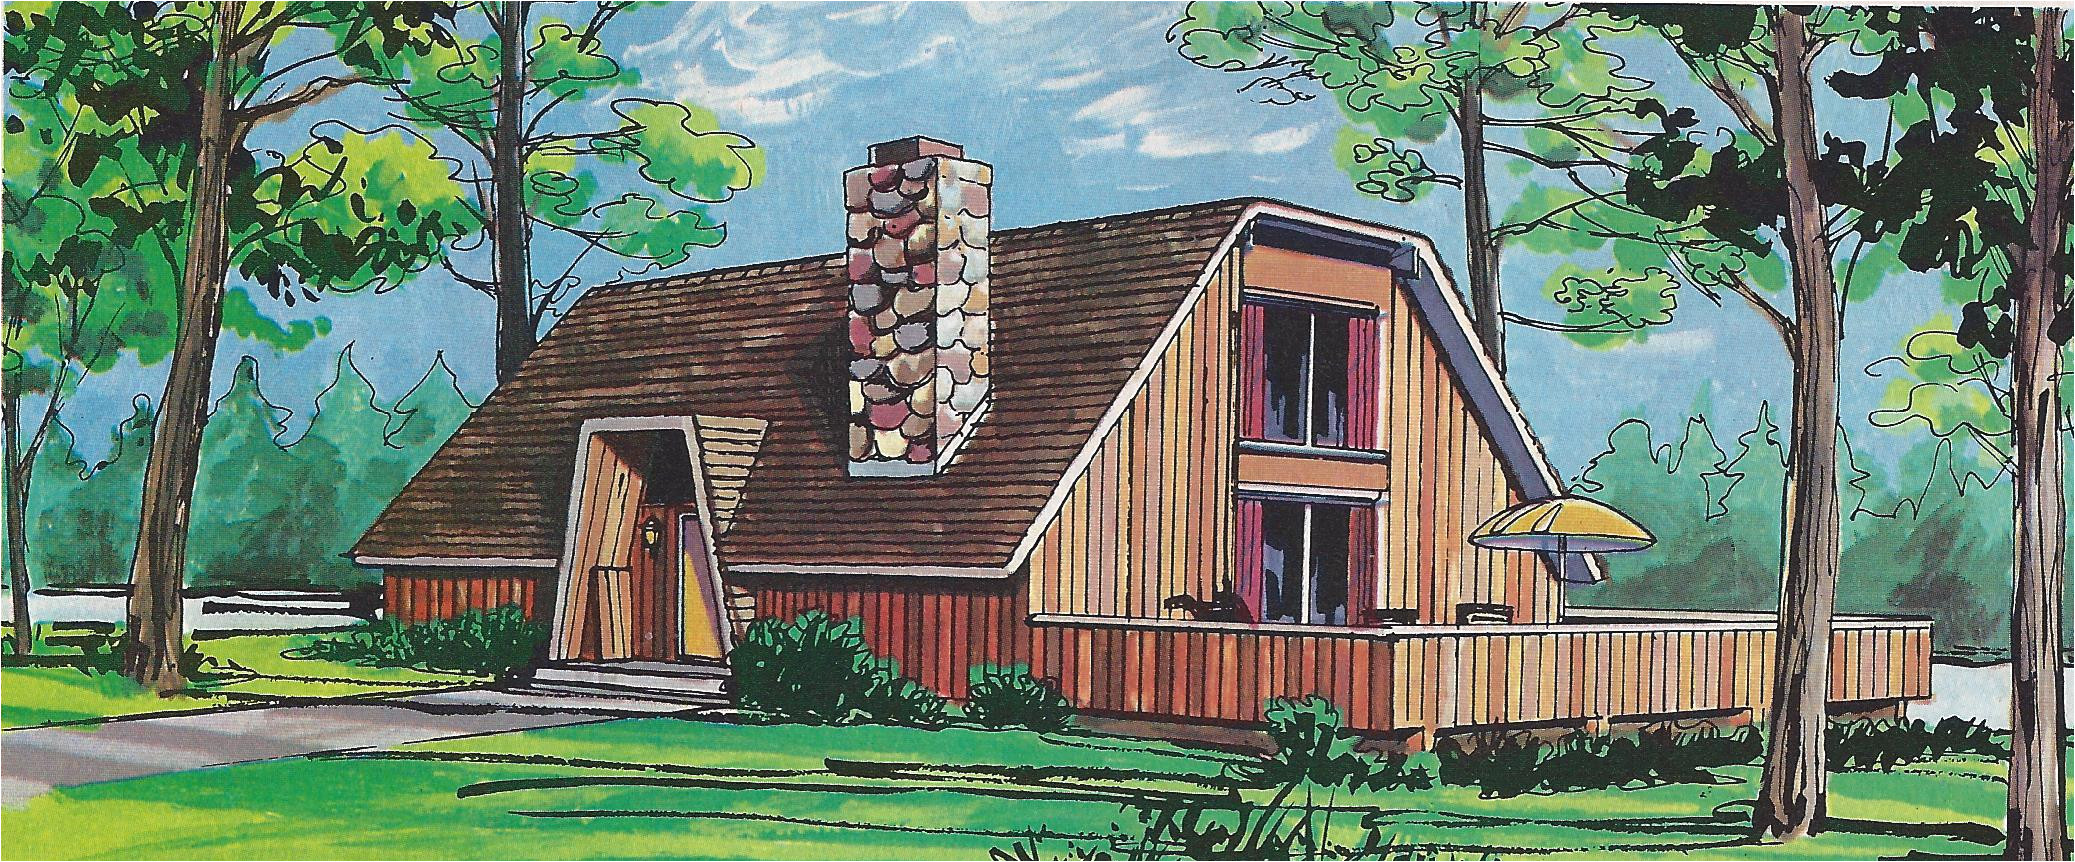 Better Home and Garden House Plans Better Homes and Gardens House Plans Better Homes and